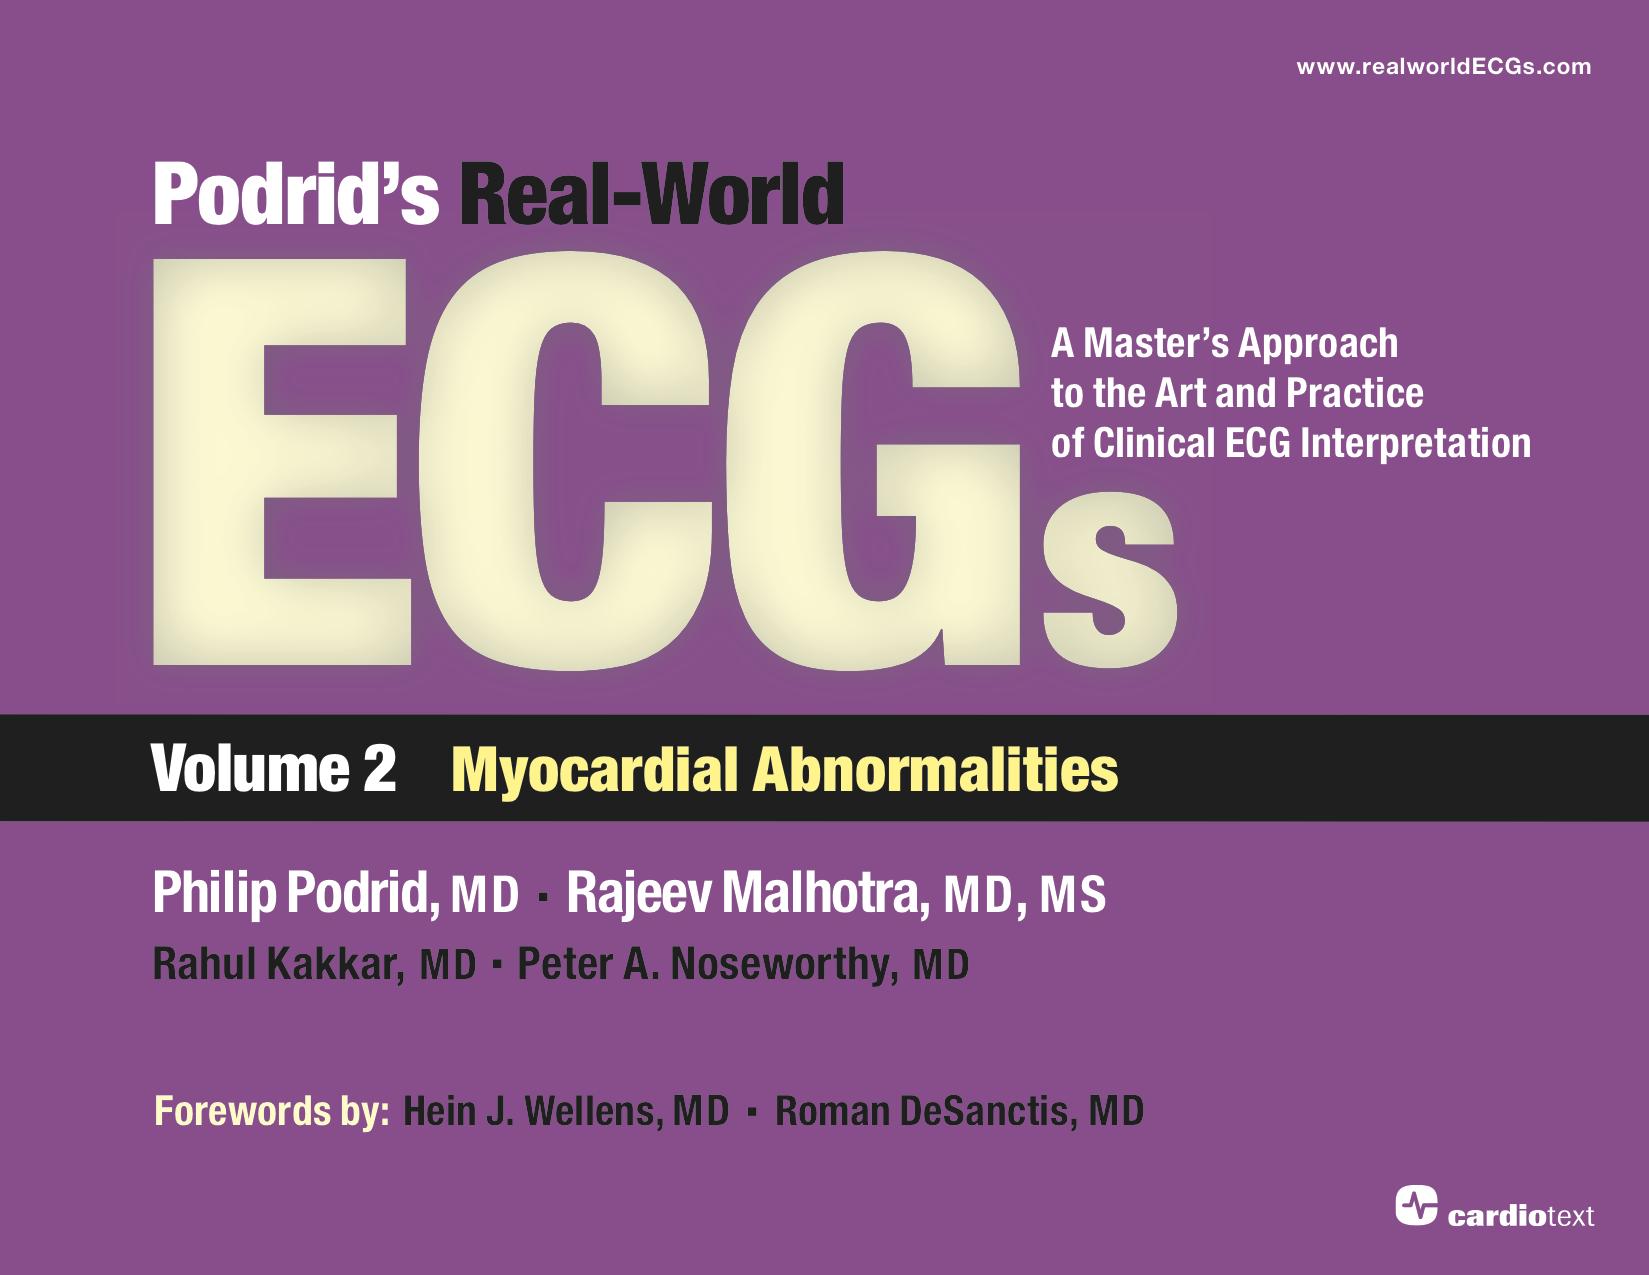 Podrid's Real-World ECGs Volume 2